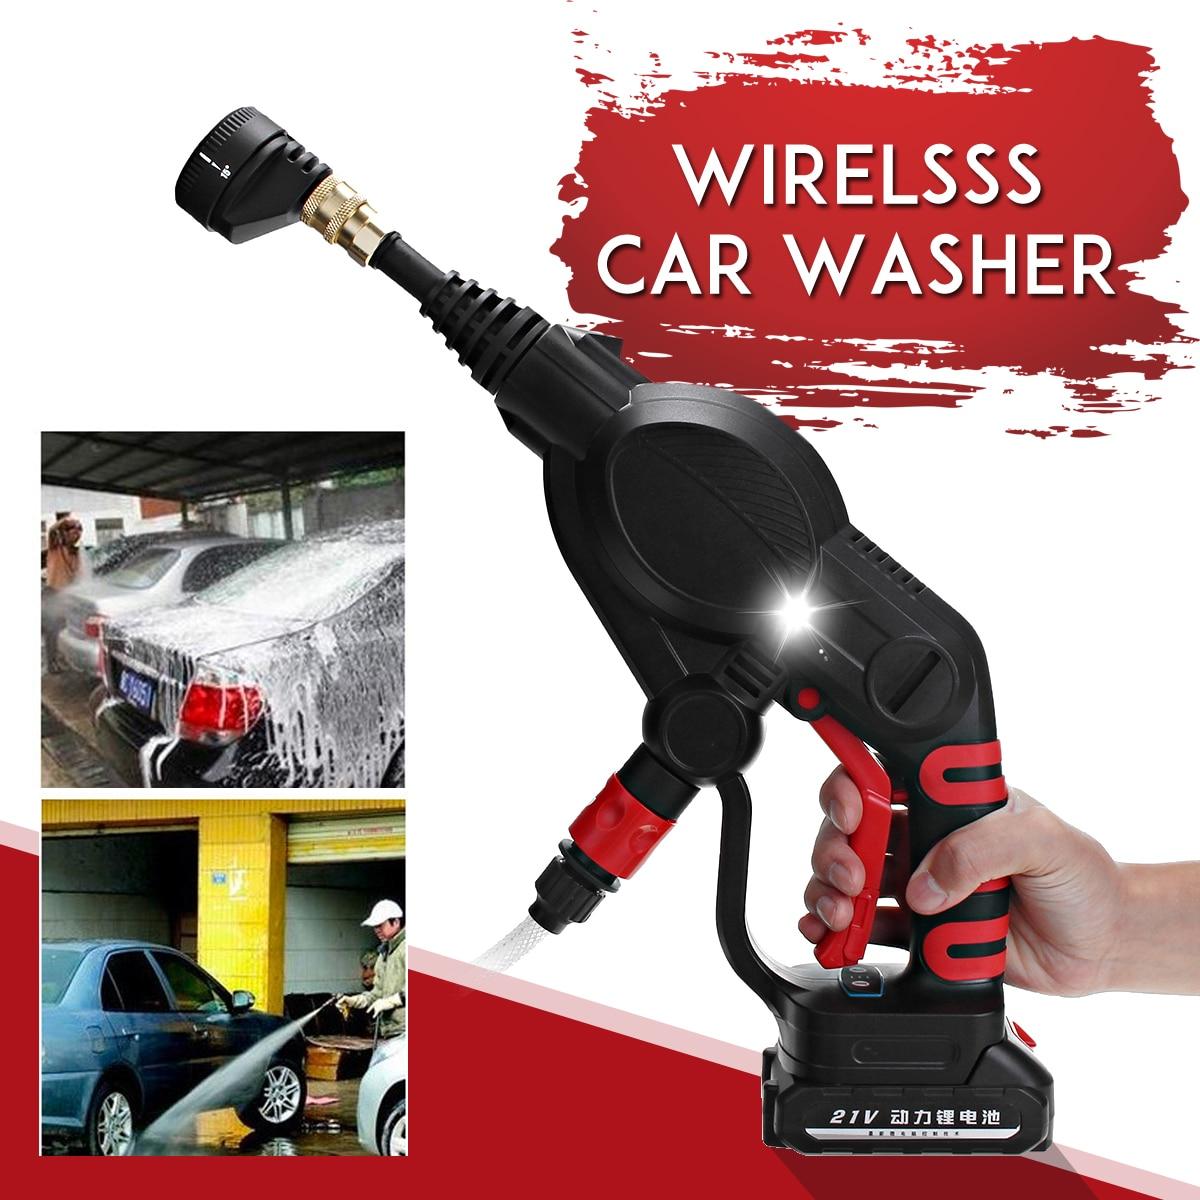 7 unids/set 20V coche lavadora inalámbrico coche recargable lavadora 2.6Mpa manguera de alta presión limpiador con 4000mAh batería de la batería lavadora